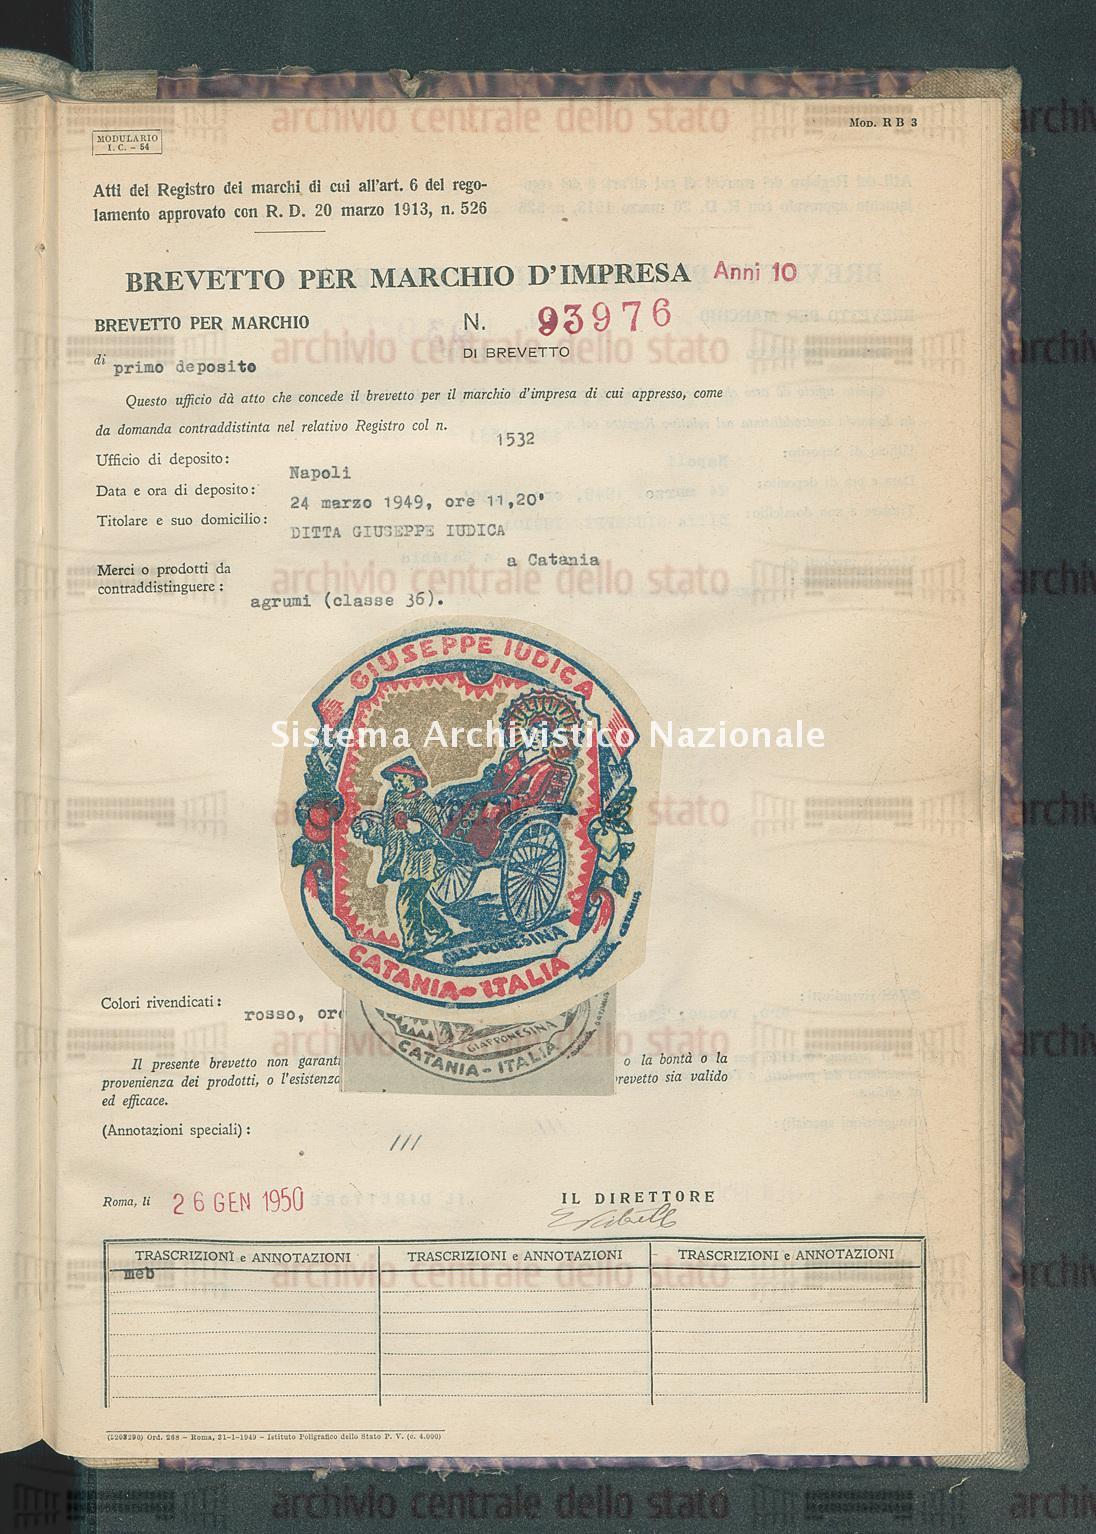 Agrumi Ditta Giuseppe Iudica (26/01/1950)